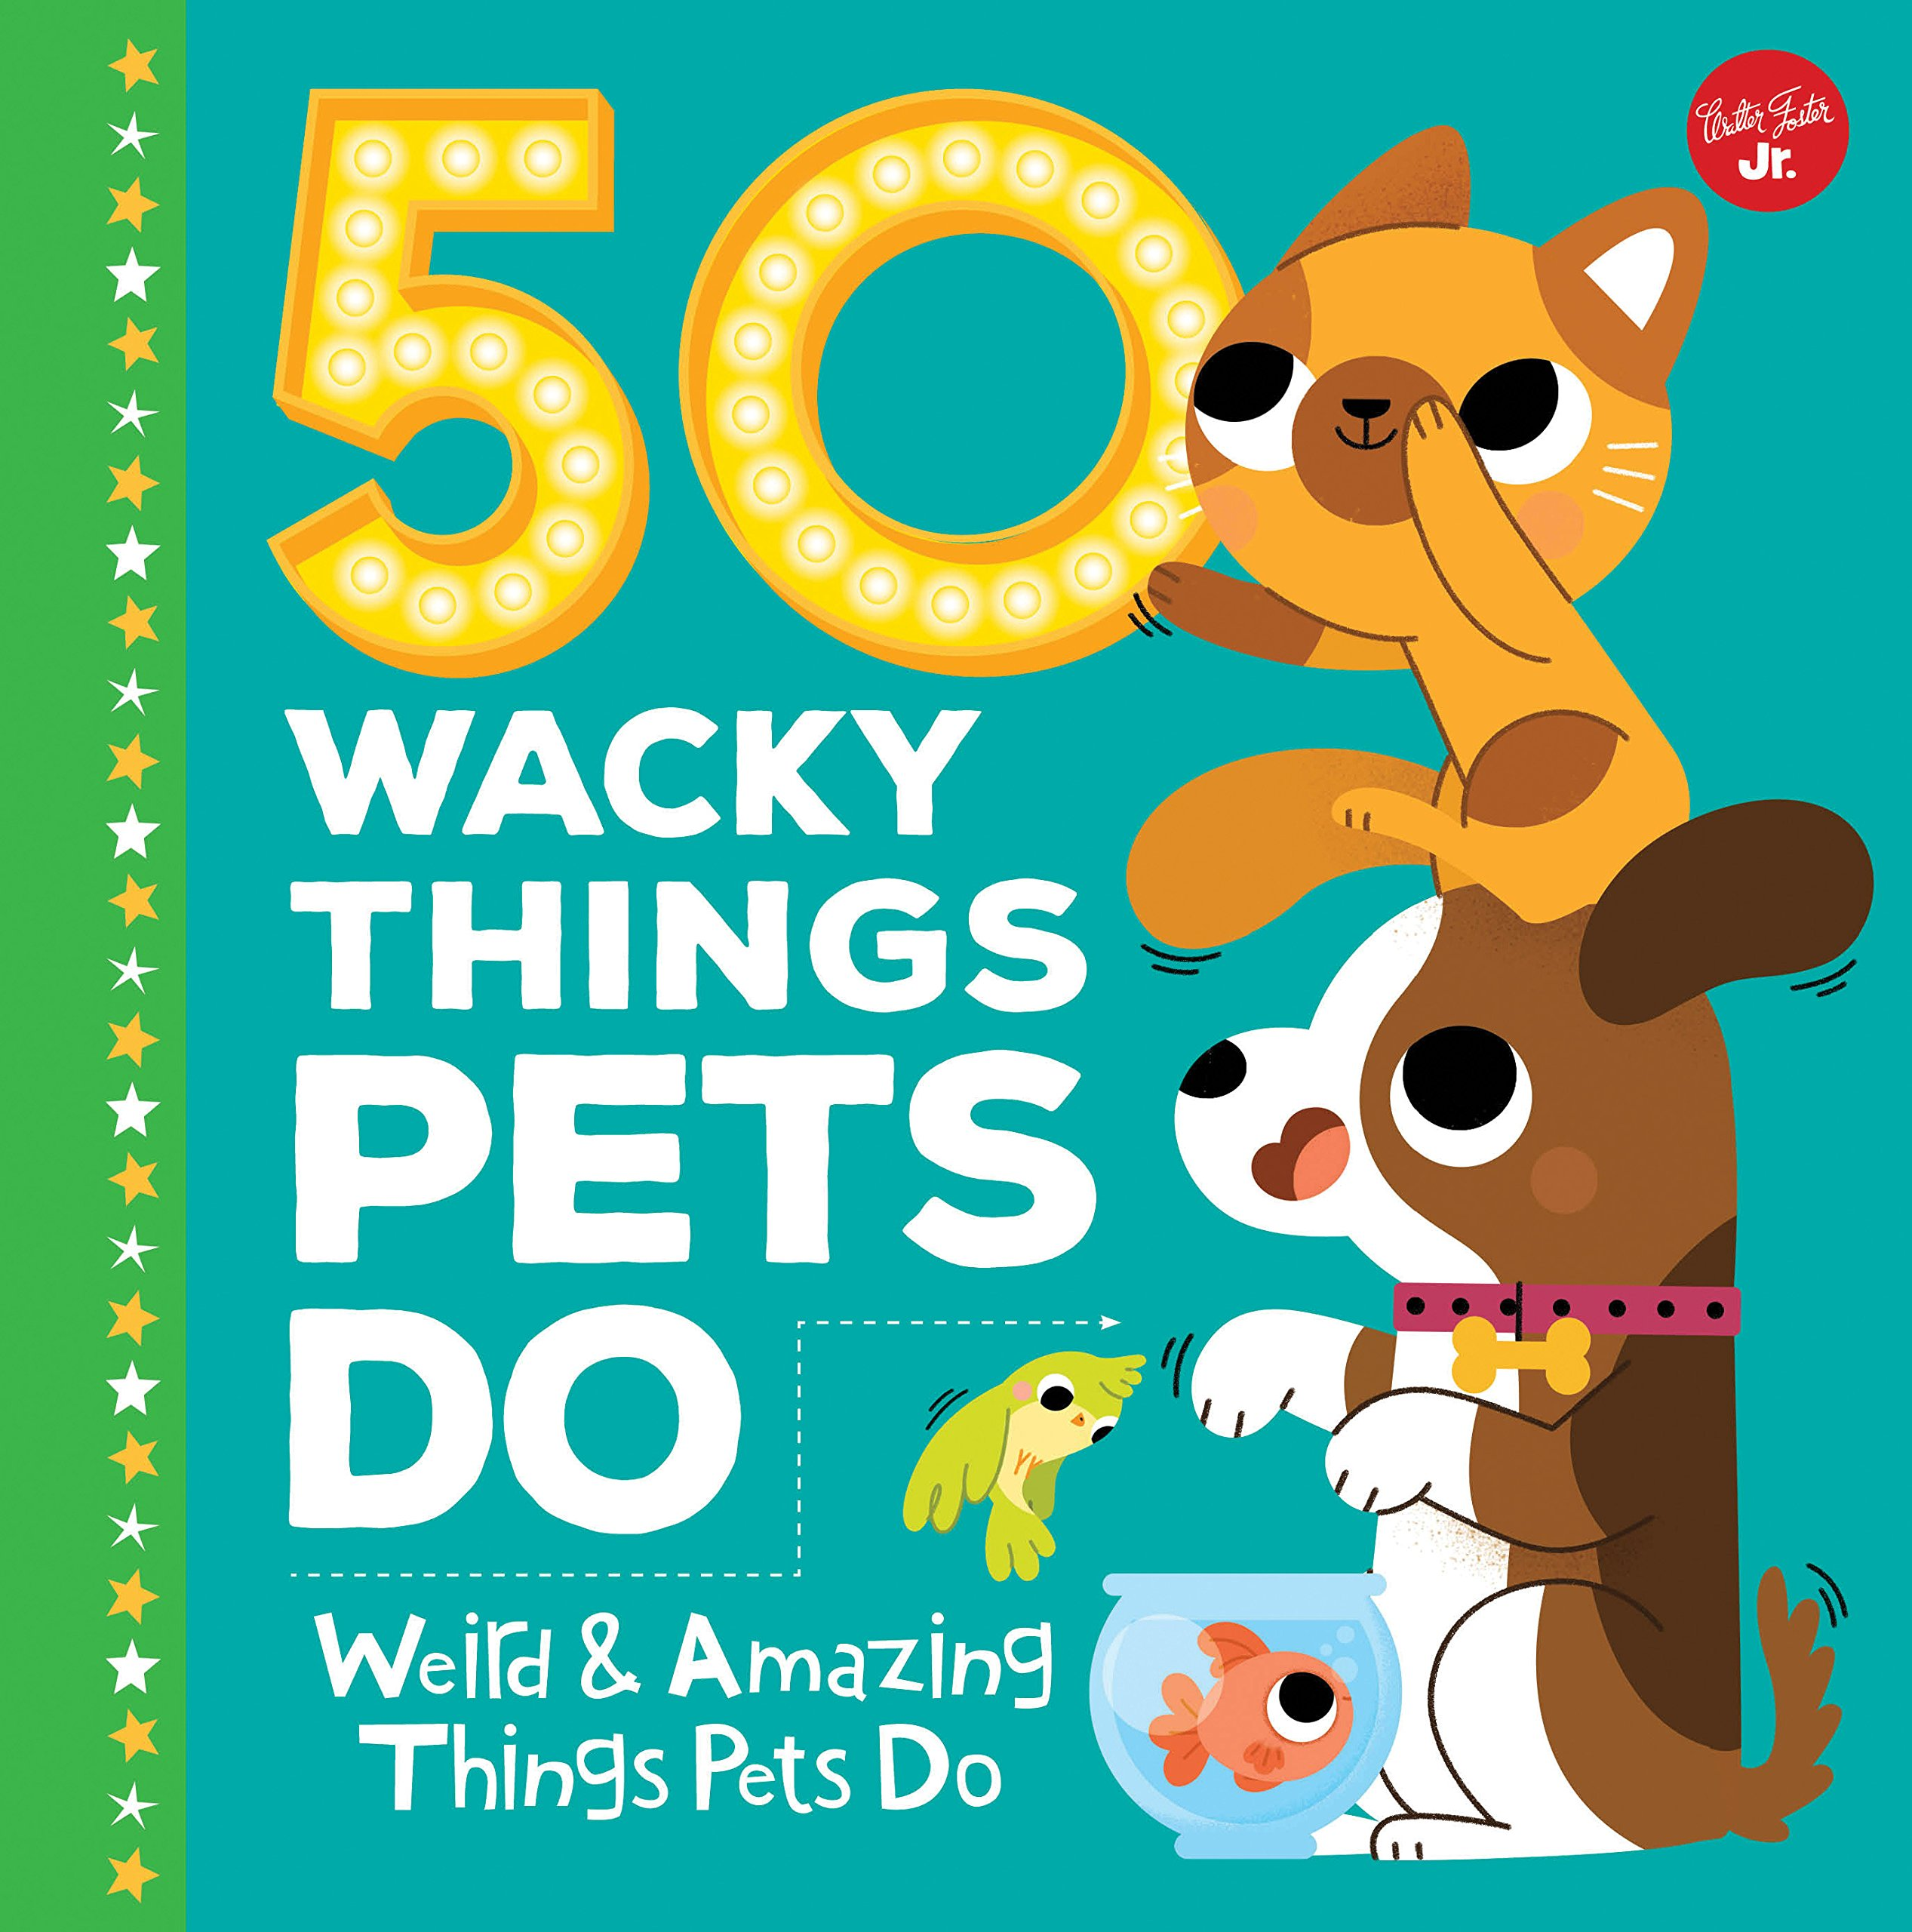 50 Wacky Things Pets Do: Weird & Amazing Things Pets Do (Wacky Series)